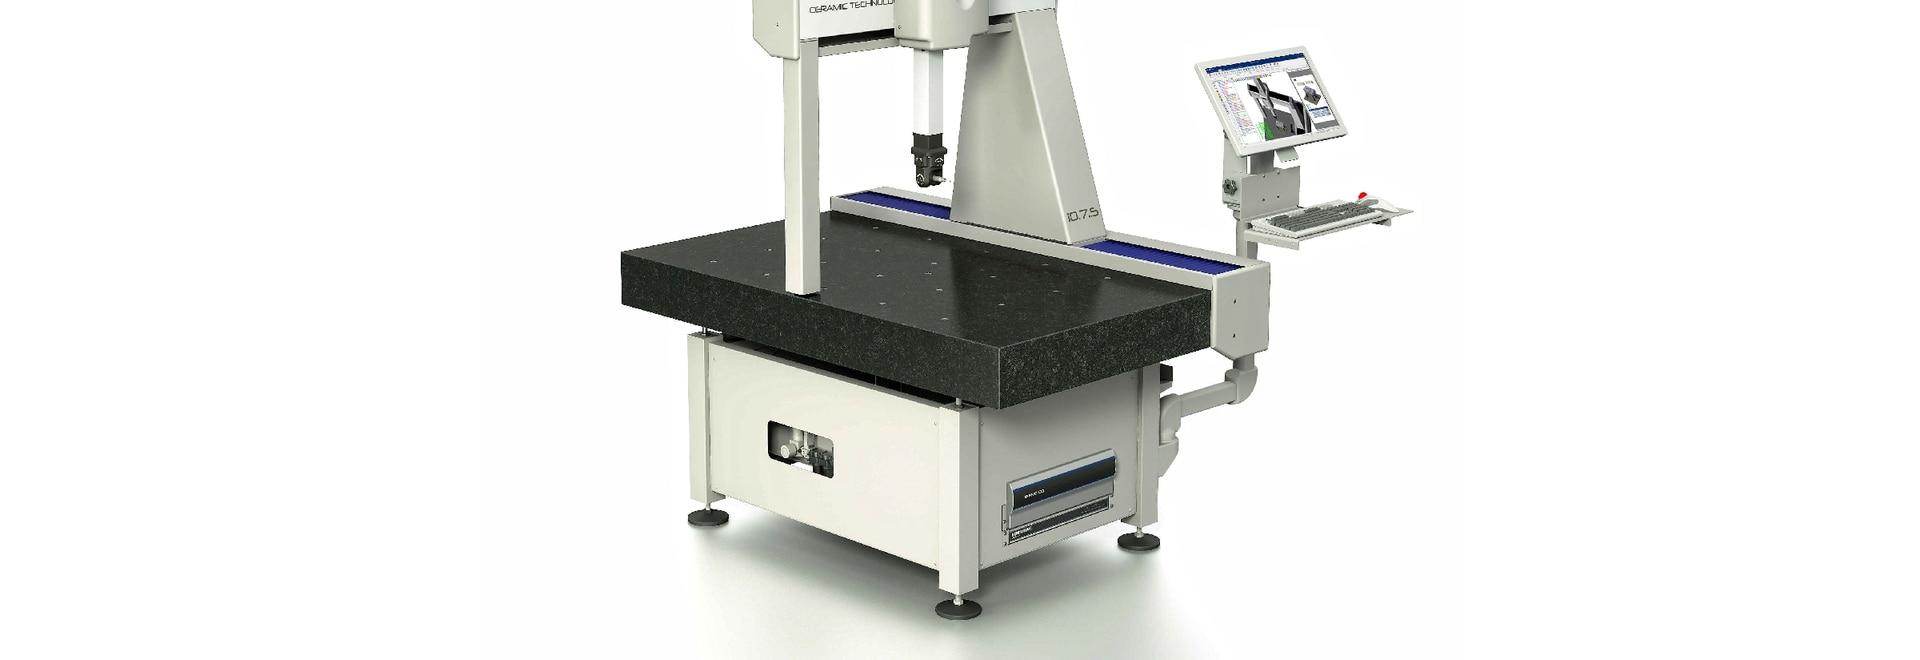 La gamme de GMAO compacts de LK Metrology